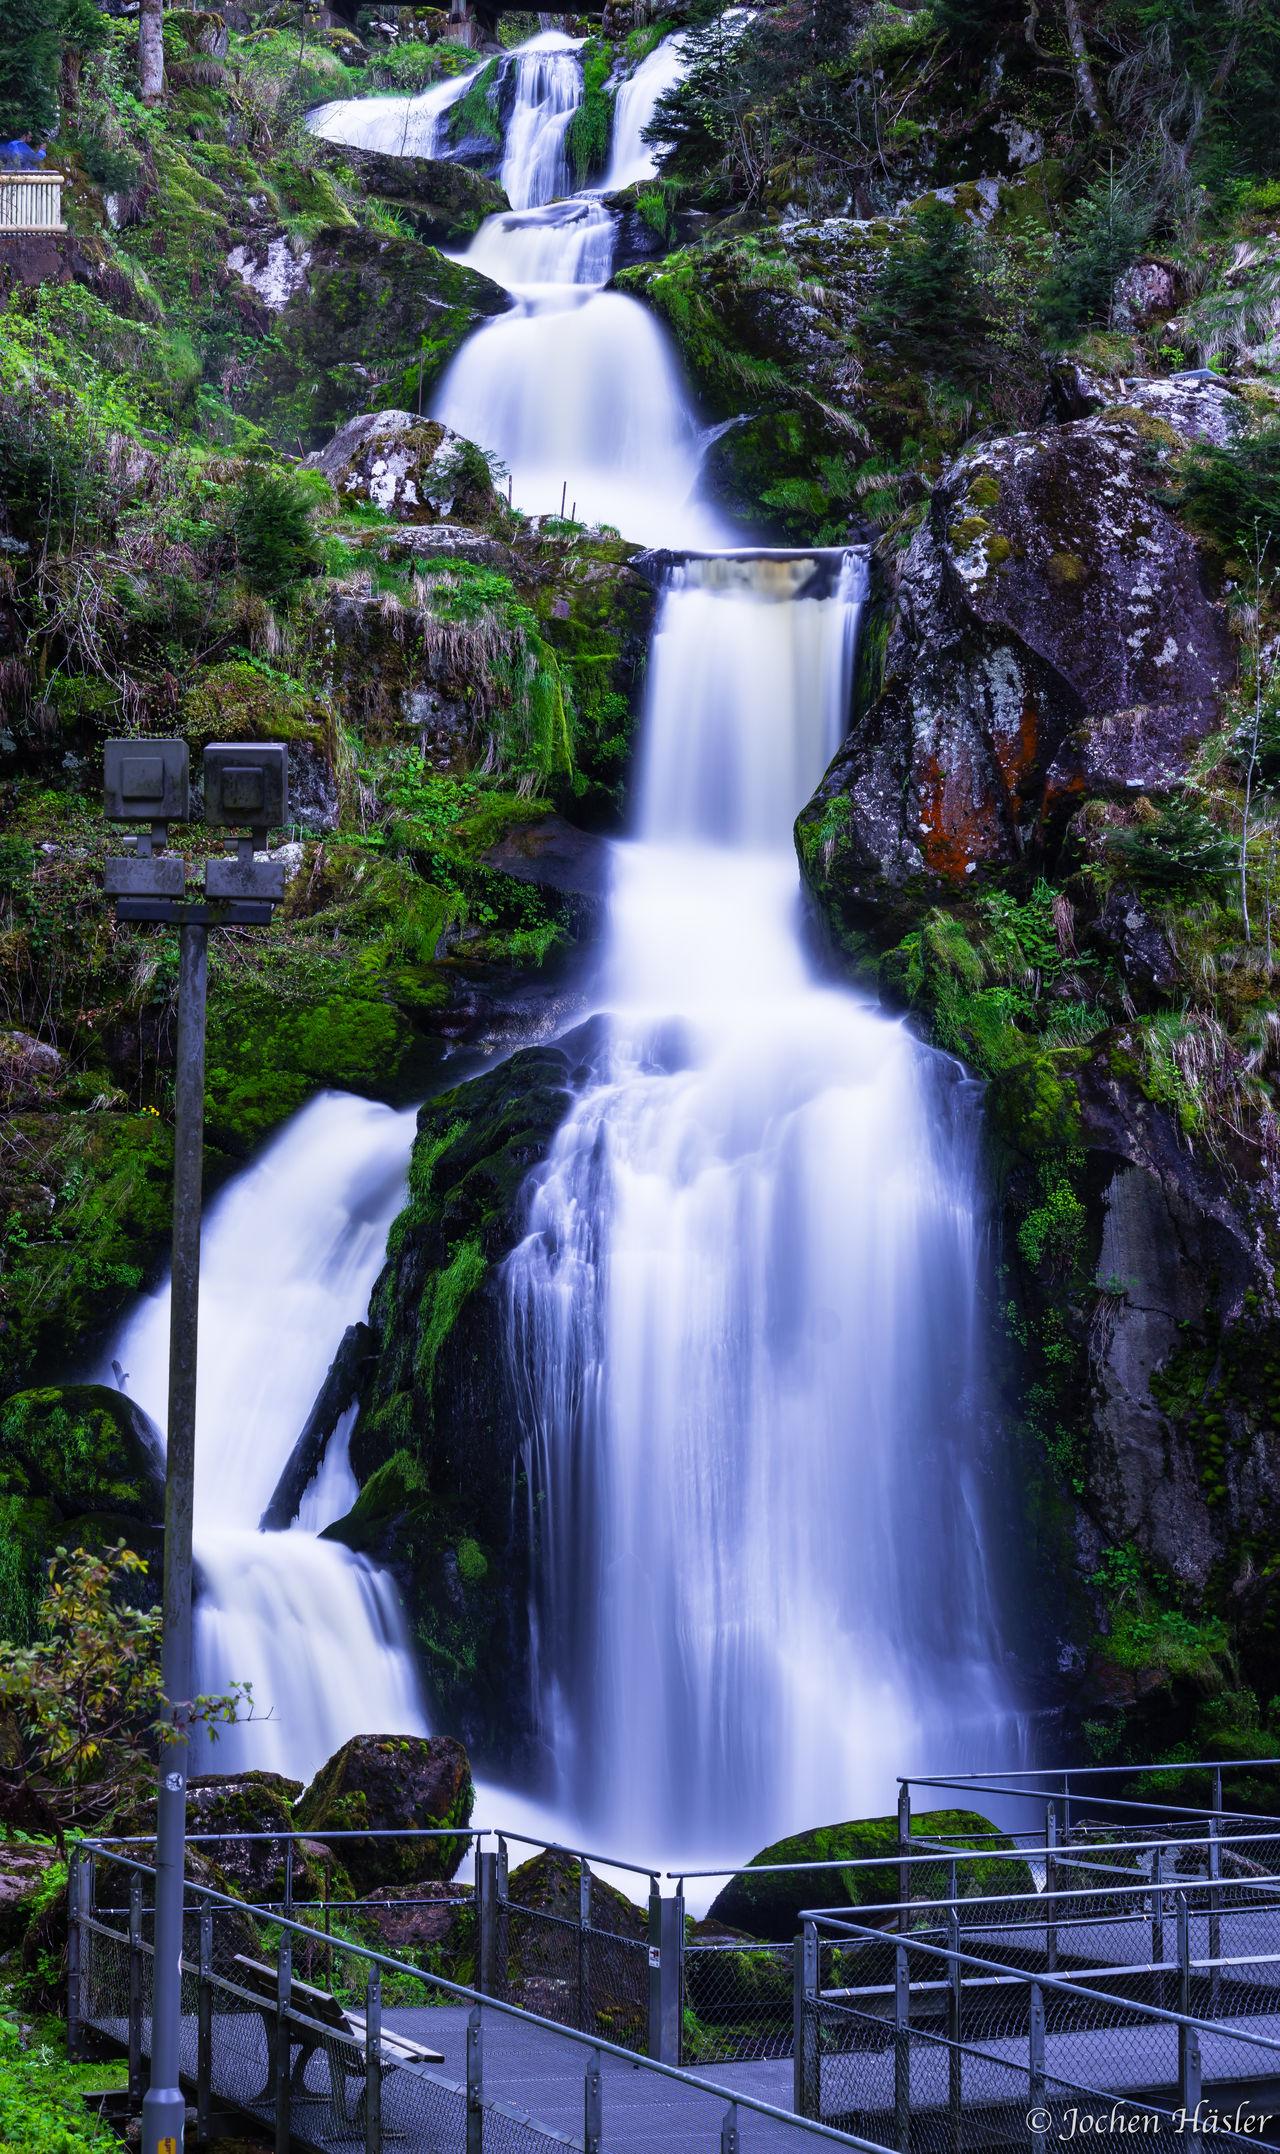 Alpha7 Alpha7m2 Bwfilter Forest Ilce-7m2 ILCE7M2 Long Exposure Nature Sirui Sony Sonyalpha Sonyalpha7 Sonyalpha7ii Triberg Triberger Wasserfälle Triberger Waterfall Water Waterfall